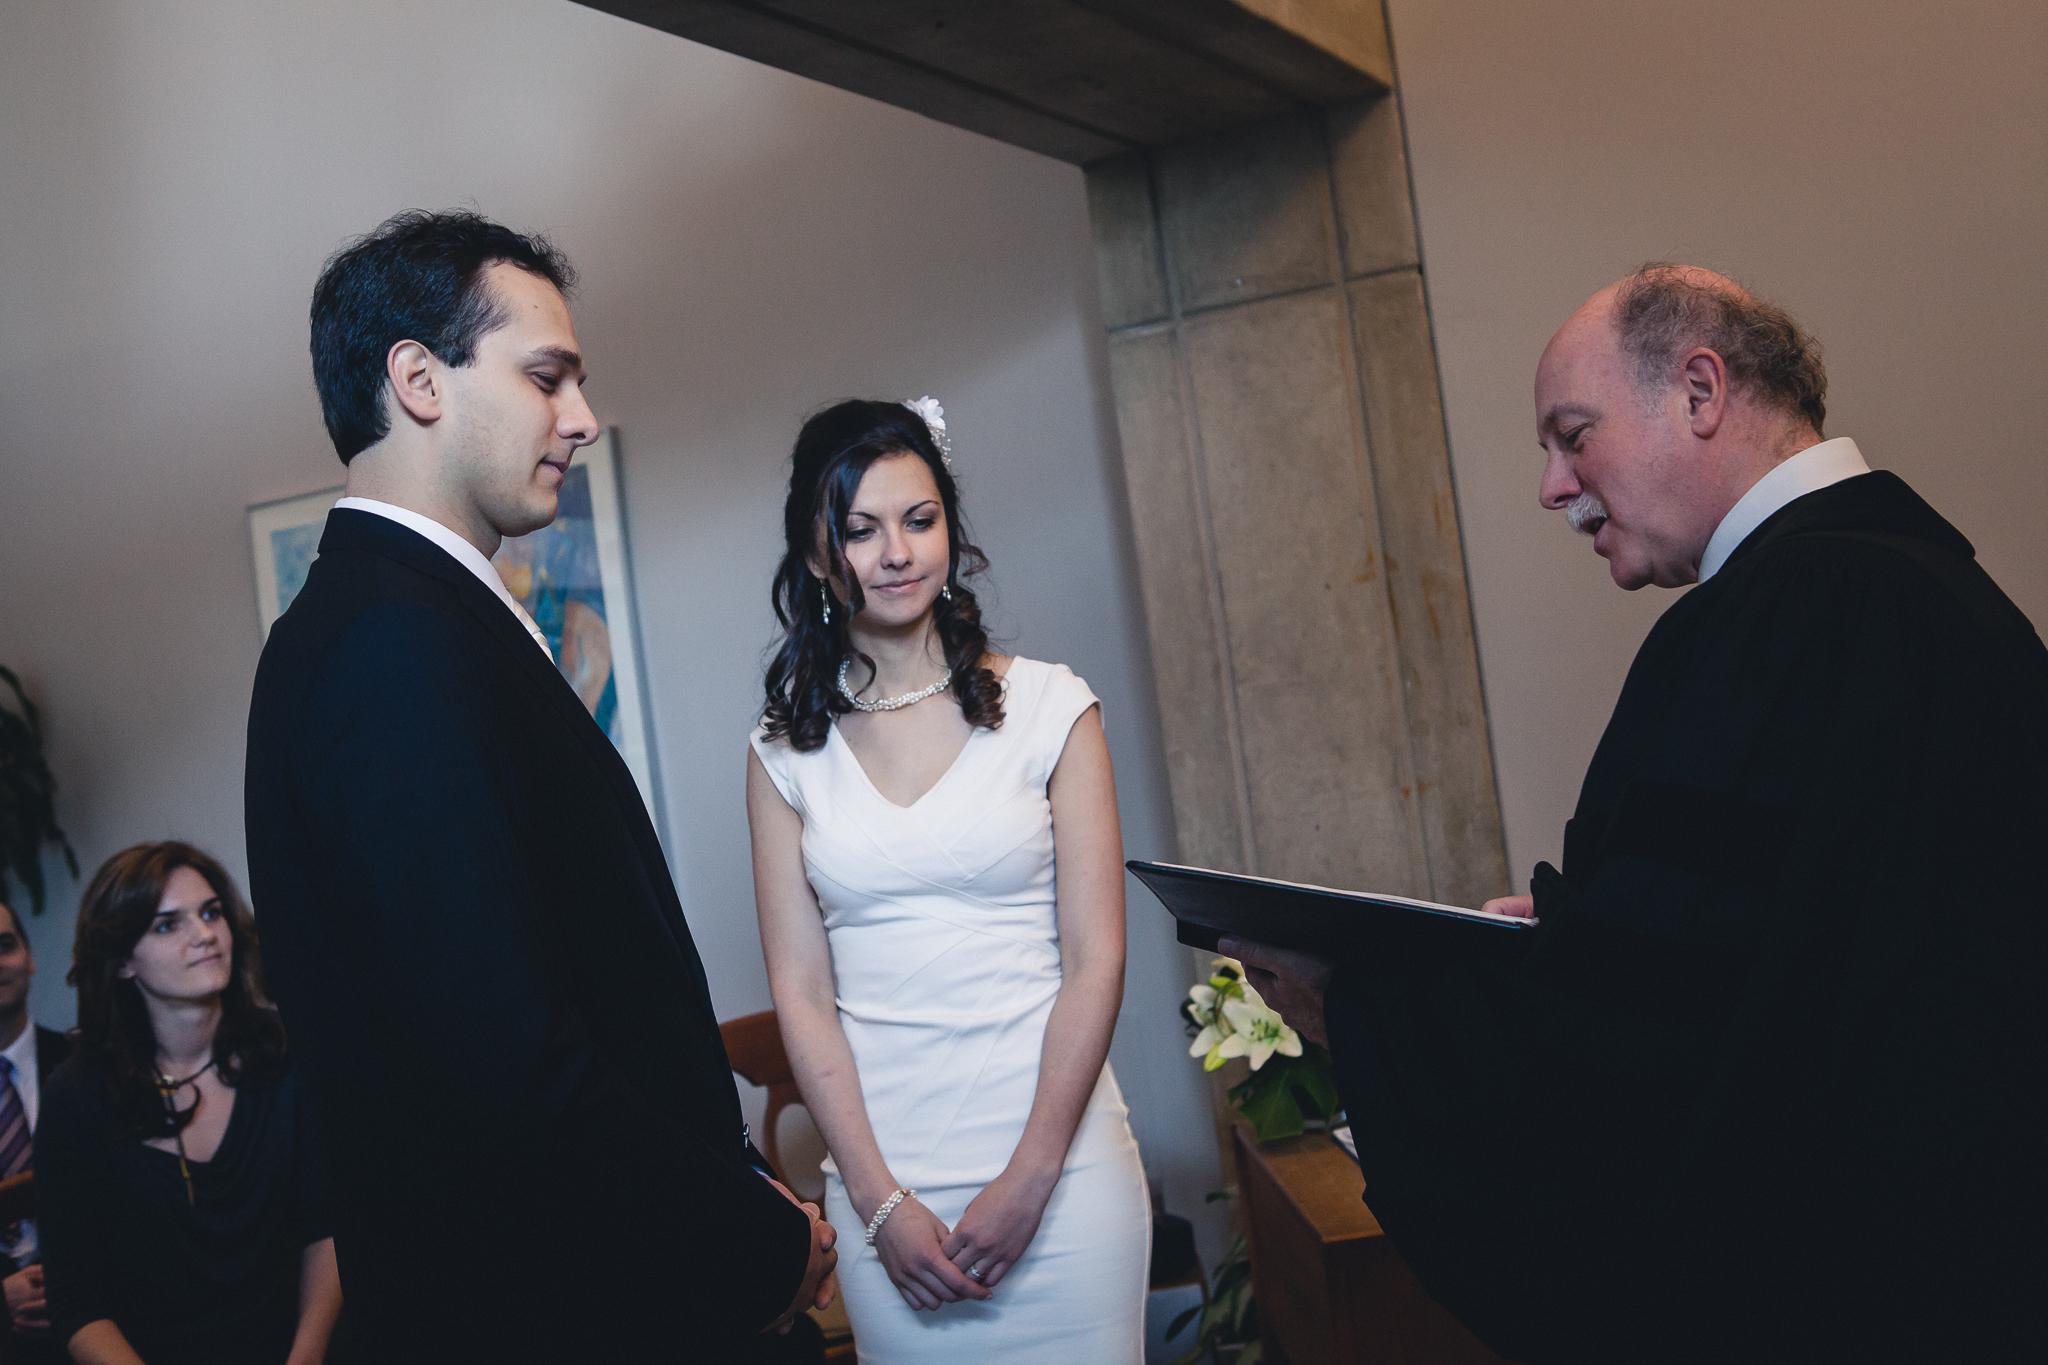 Toronto Wedding Photography - Zoya & Alexei -8.jpg